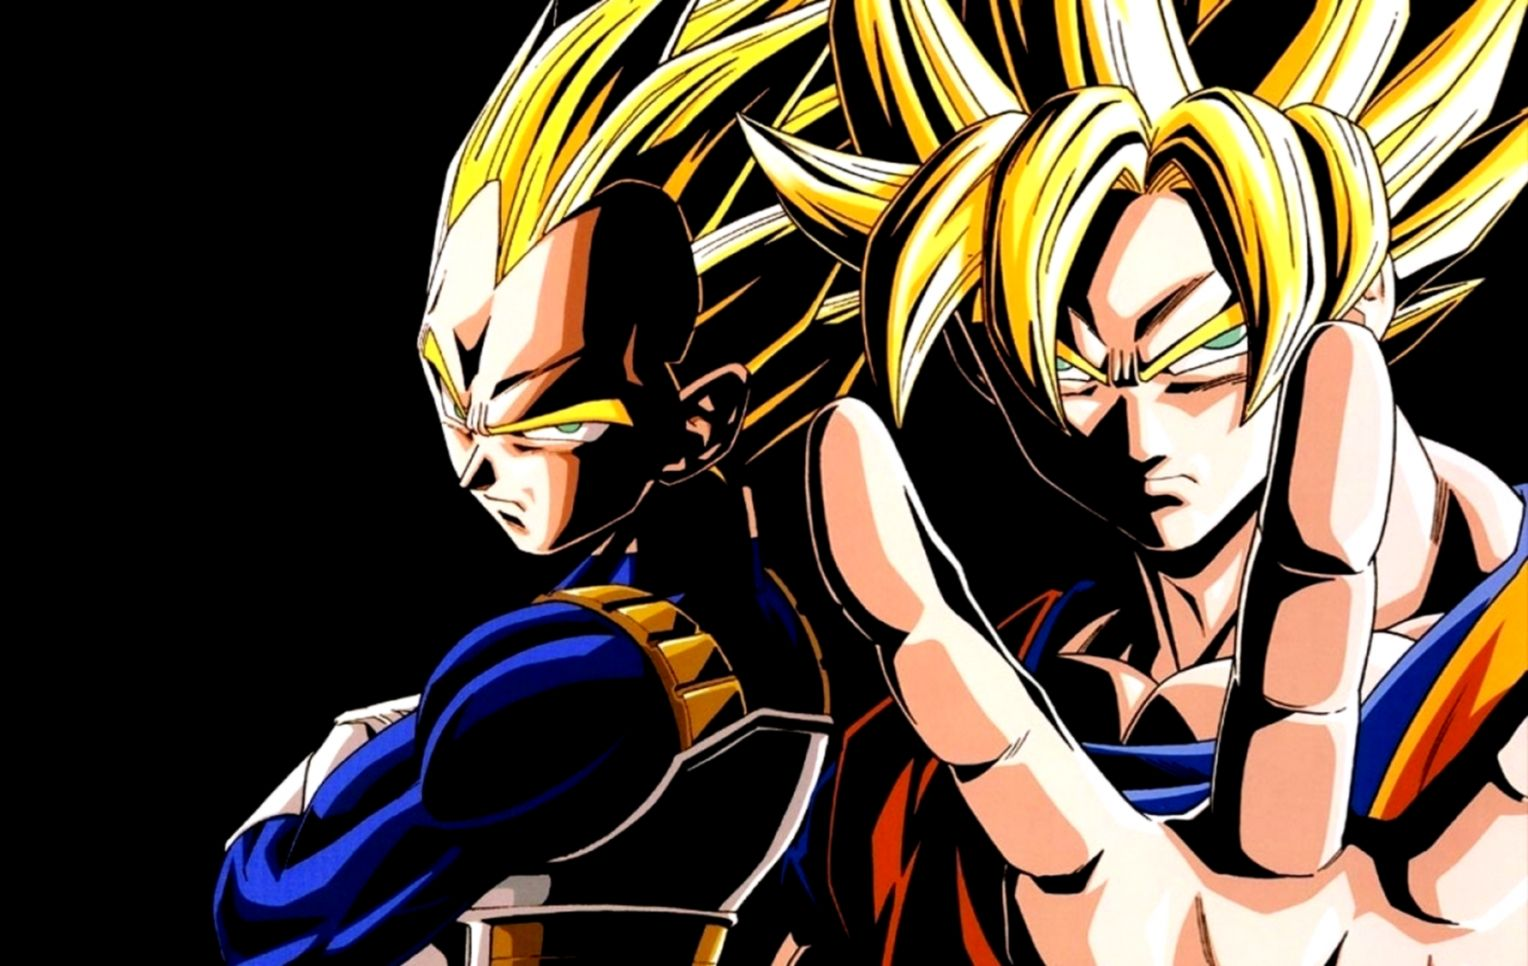 Dragon Ball Z Super Saiyan Goku Vs Vegeta Wallpaper Hd